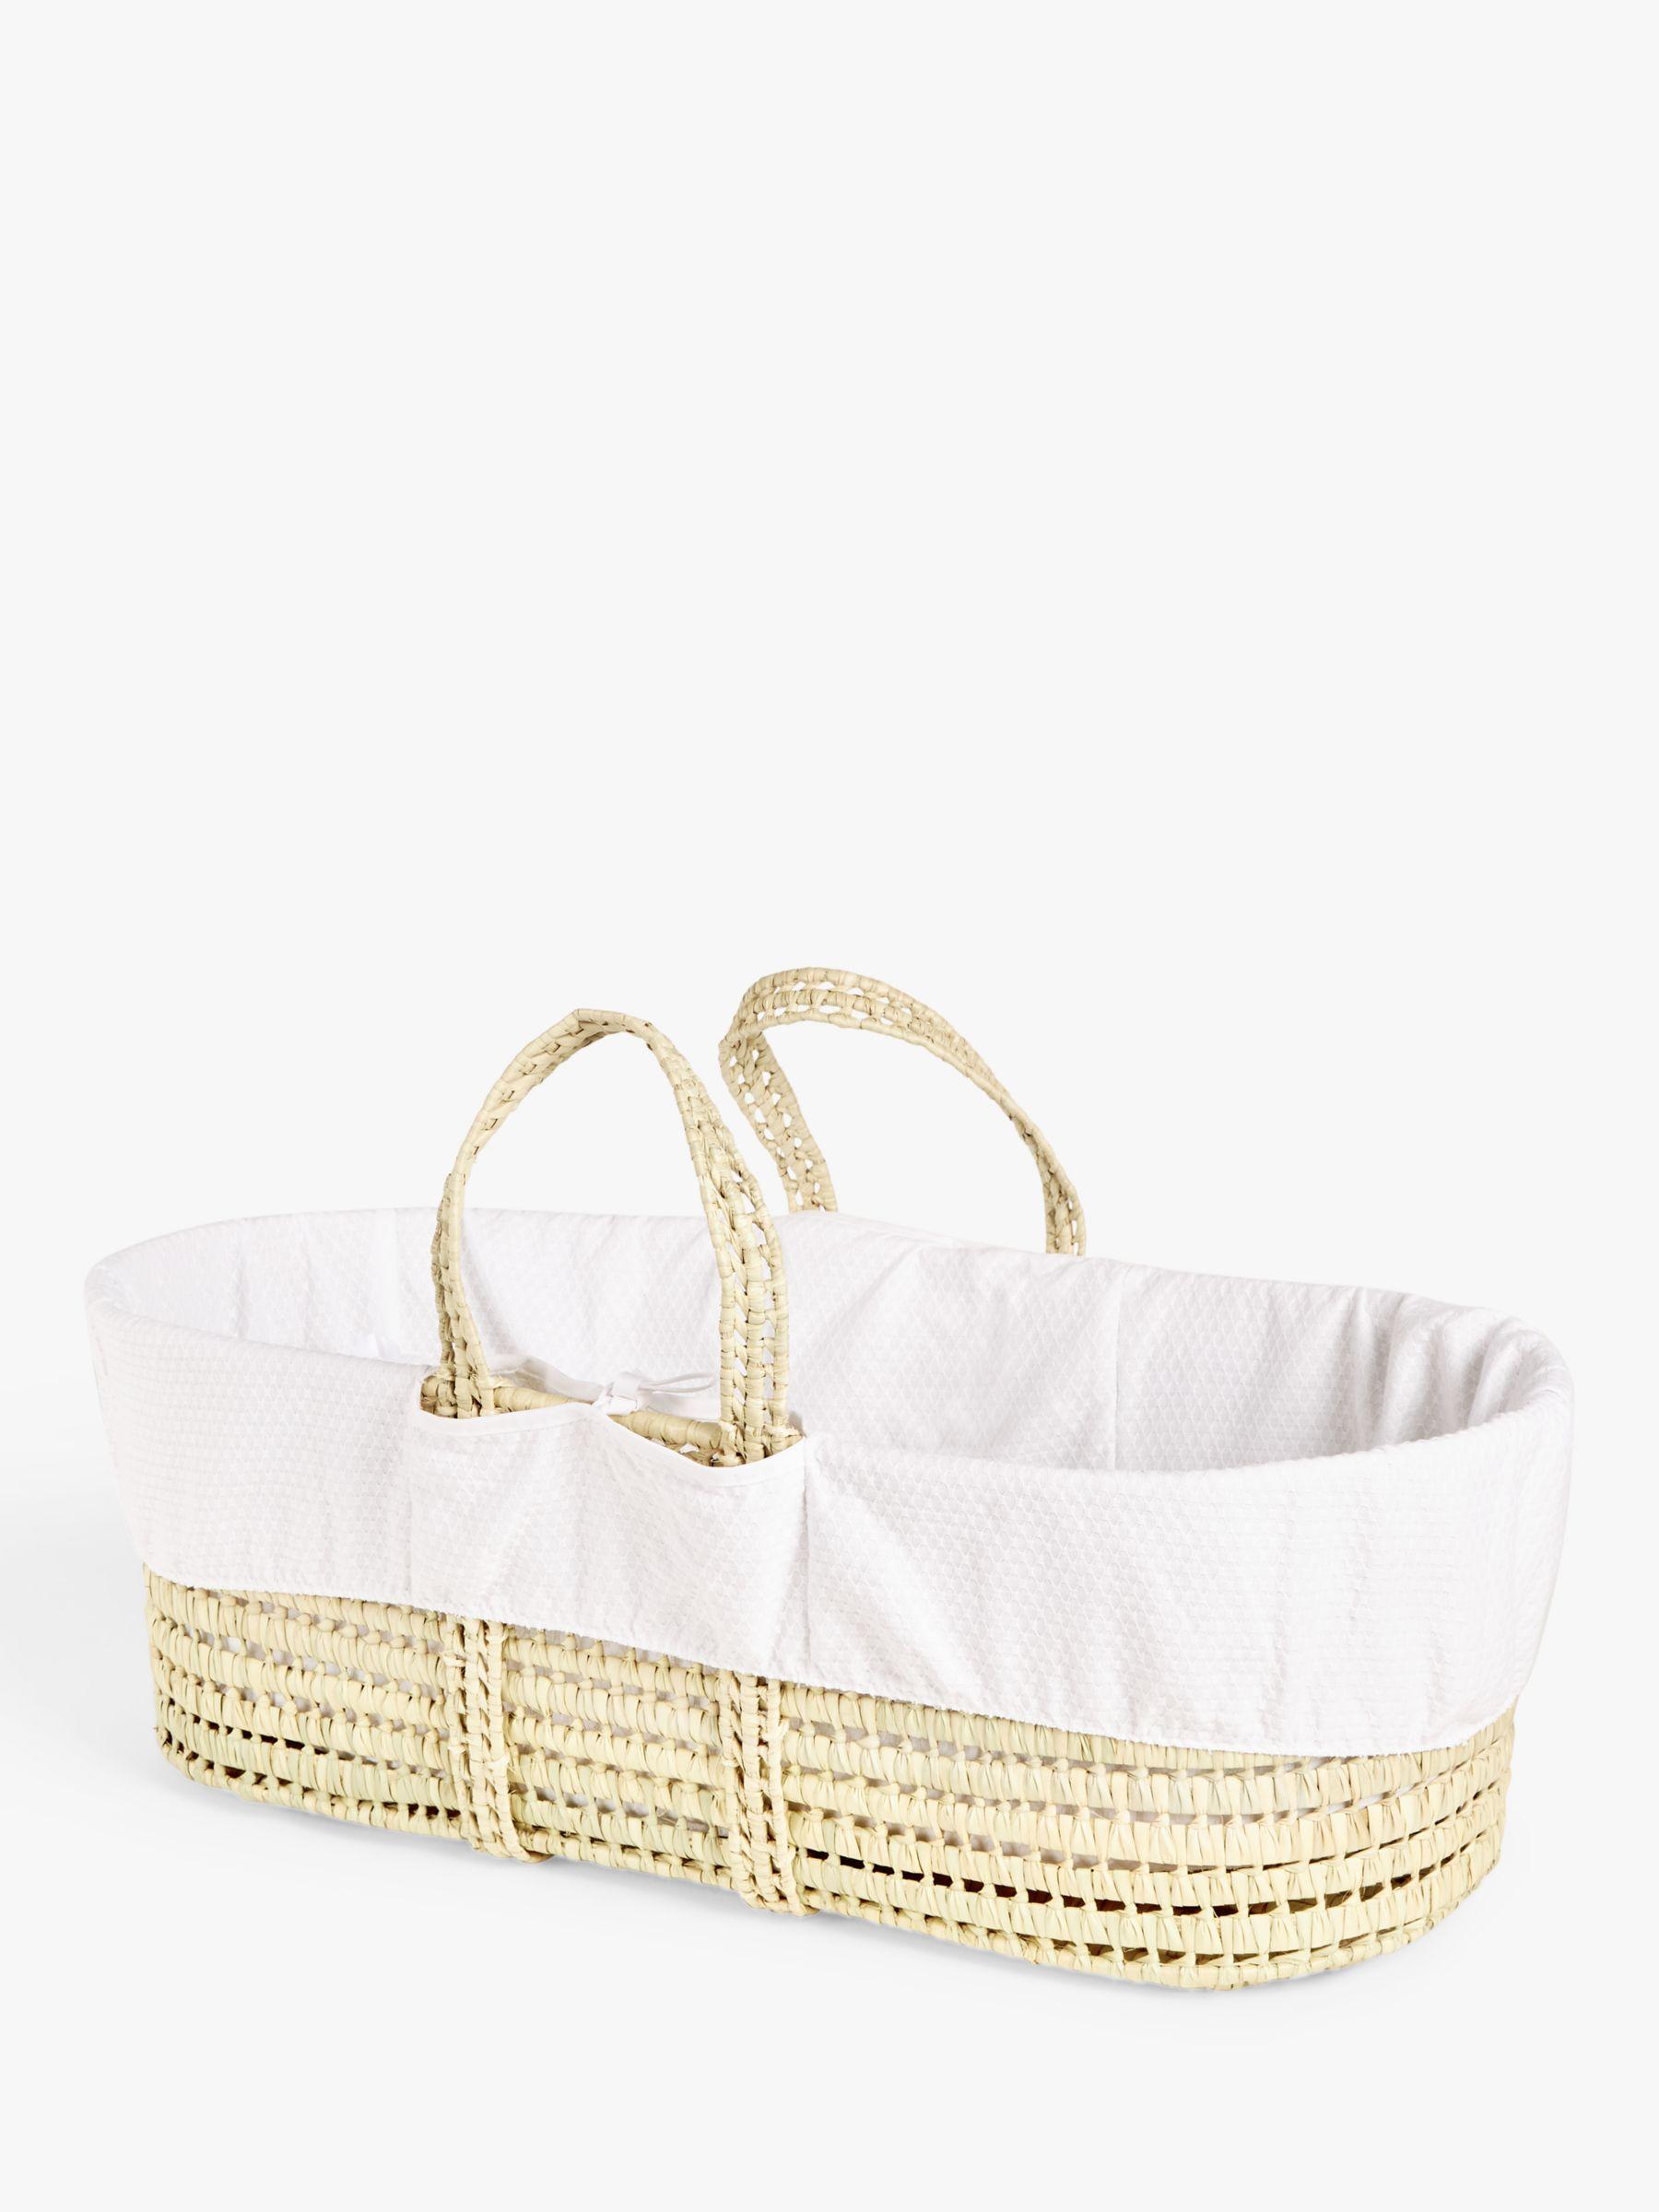 ANYDAY John Lewis & Partners Moses Basket, White